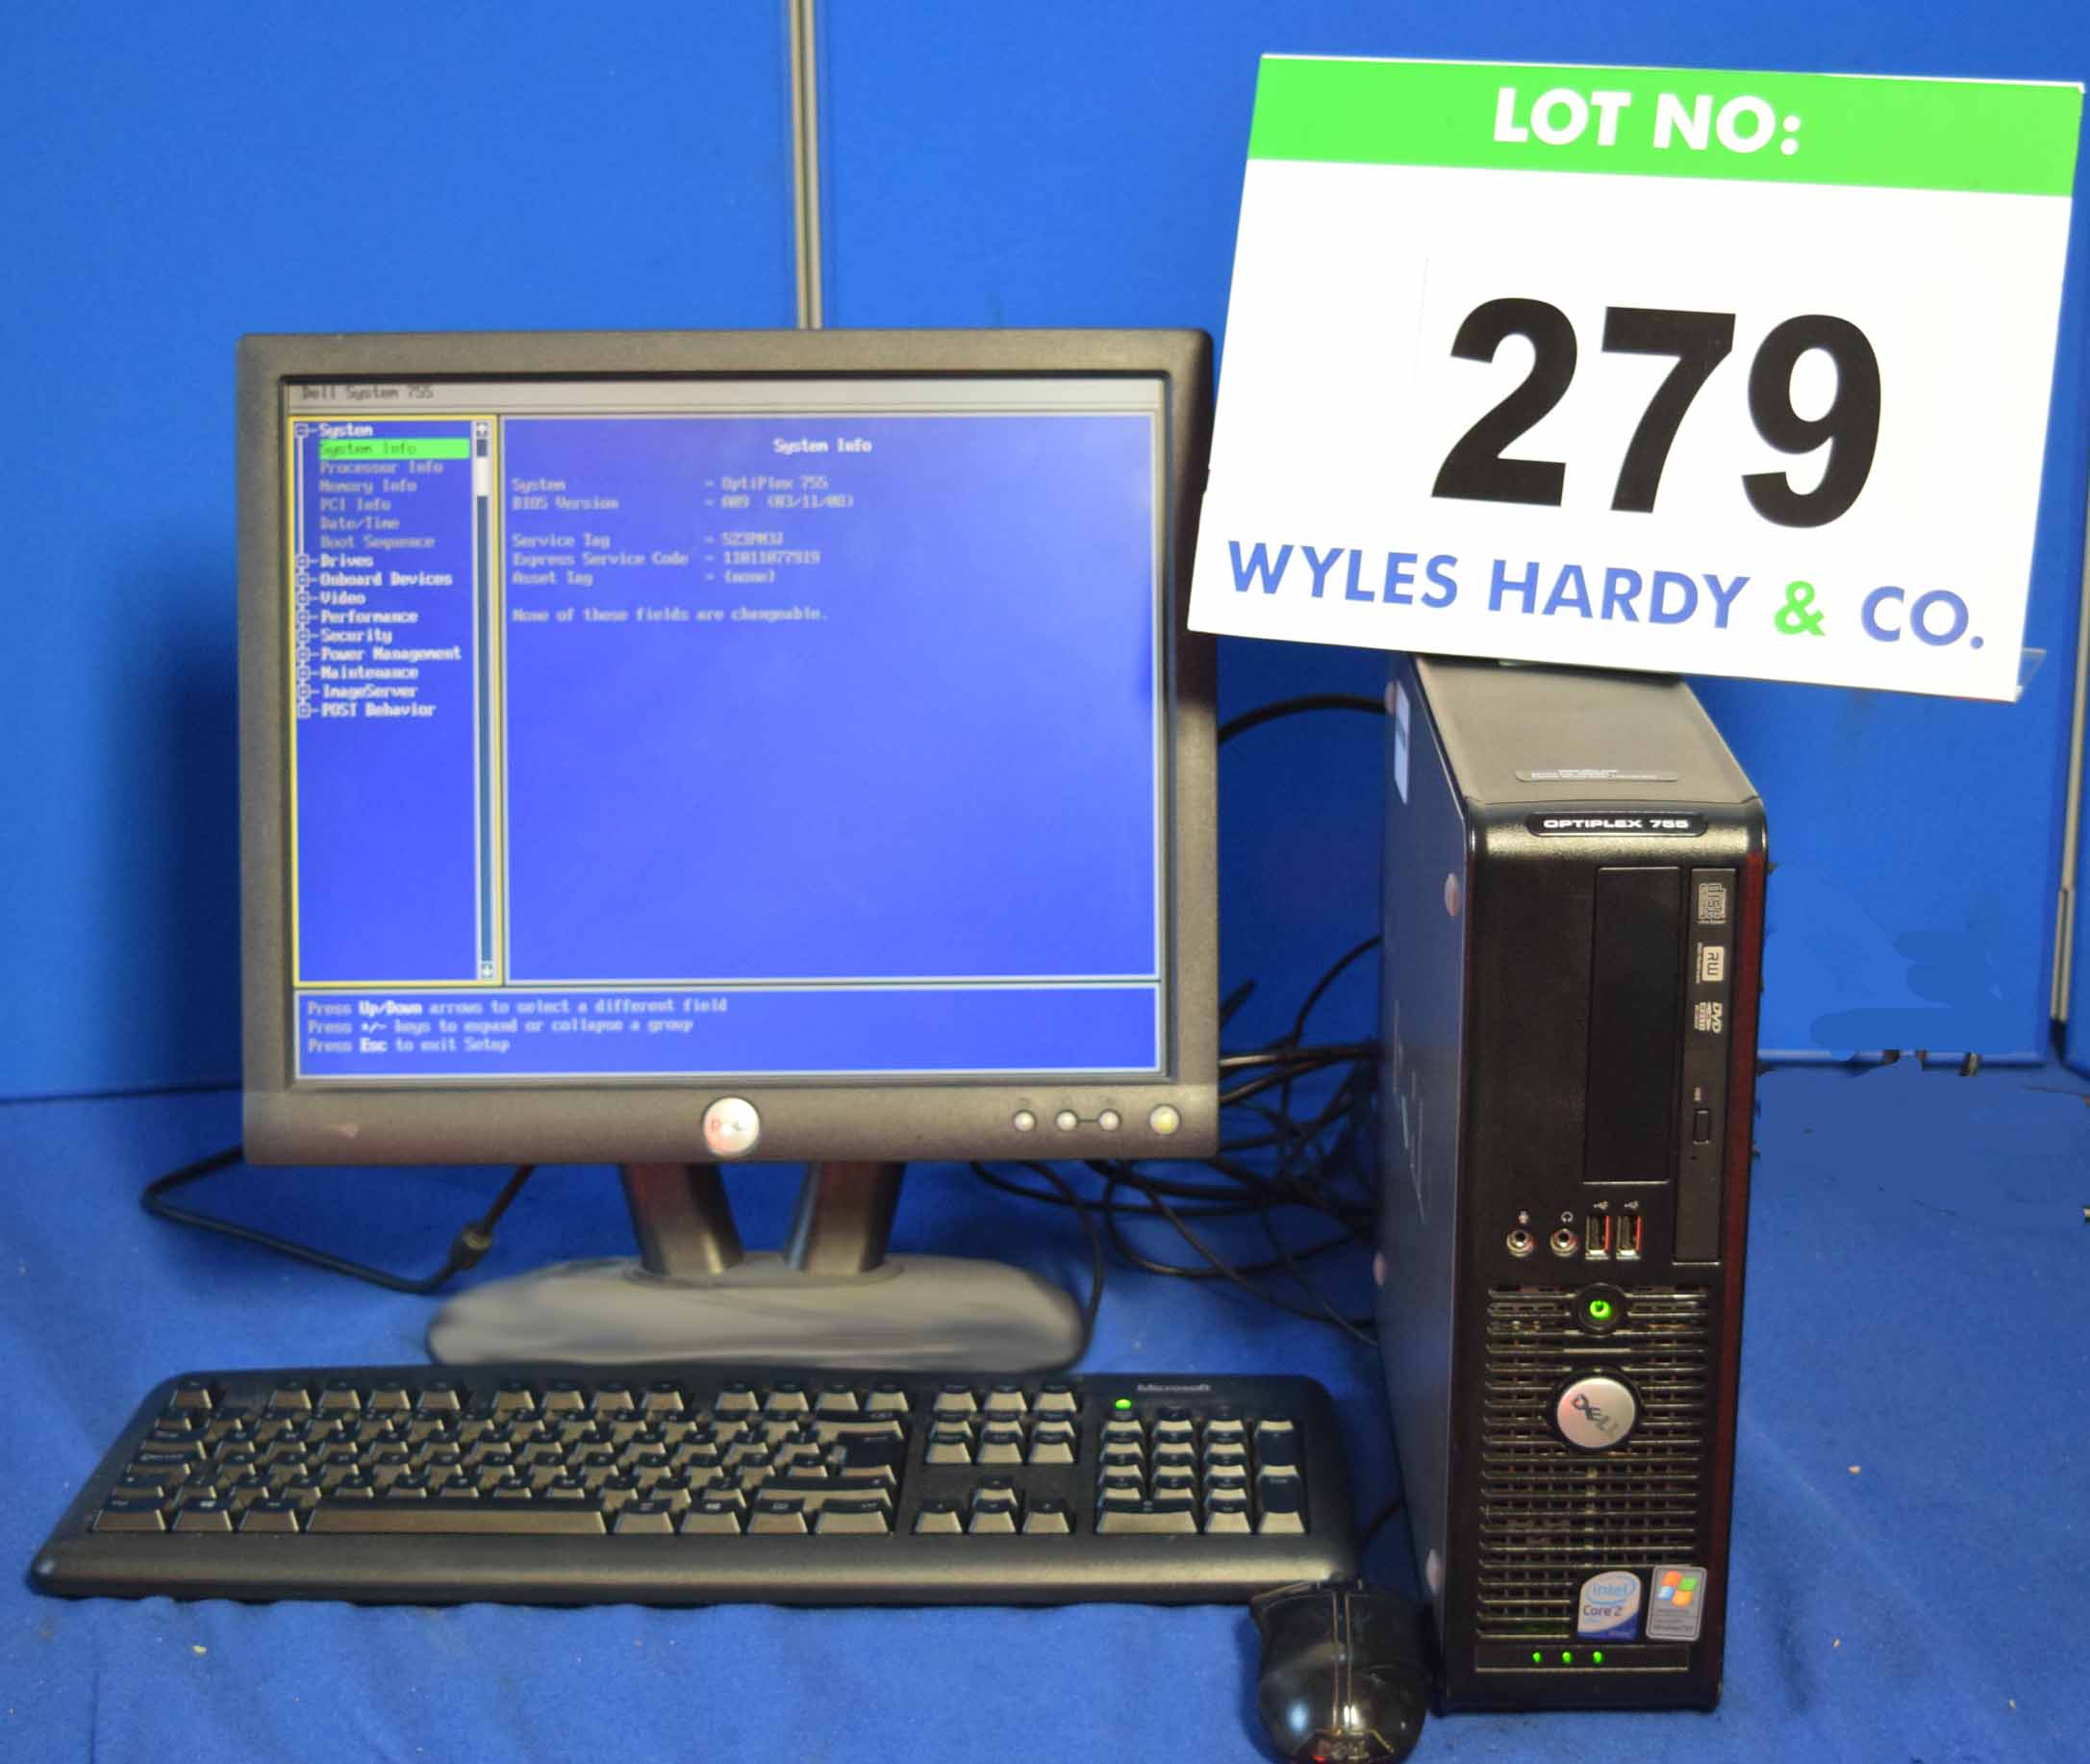 Dell Optiplex 5060 Desktop Wireless Drivers also Extra Okazie Pc Intel Quad Core 2gb 160gb Dvd Rw Video Gma X4500 A185099345 together with Dell Laptop Lock also Ordinateur De Bureau Dell 3839 further Index php. on dell optiplex 280